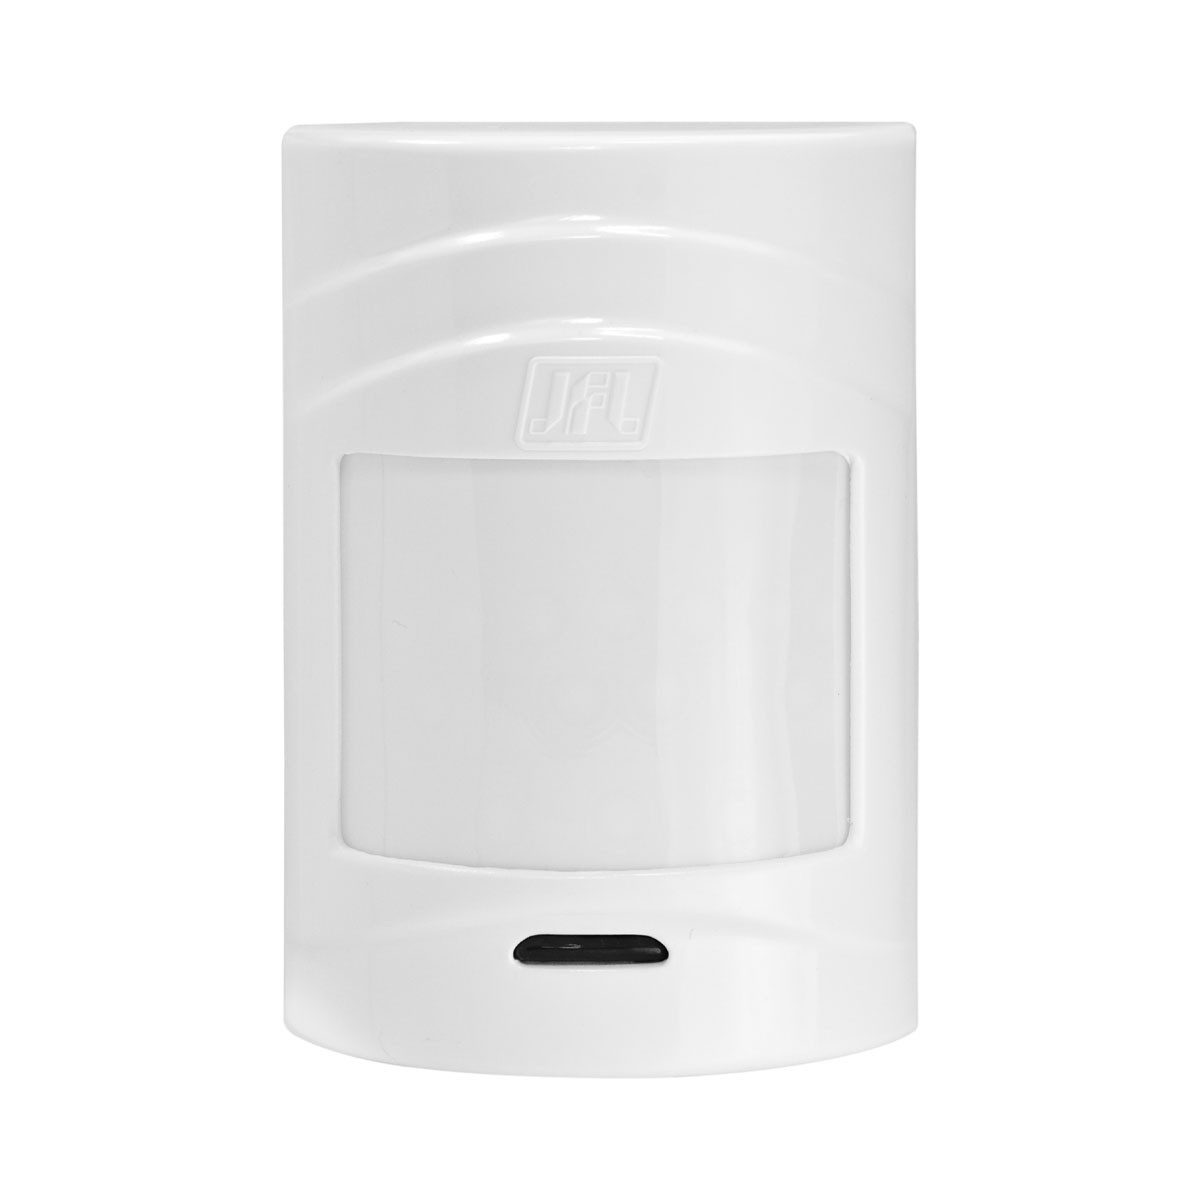 Kit Alarme SmartCloud 32 Jfl Com Sensores Sem Fio